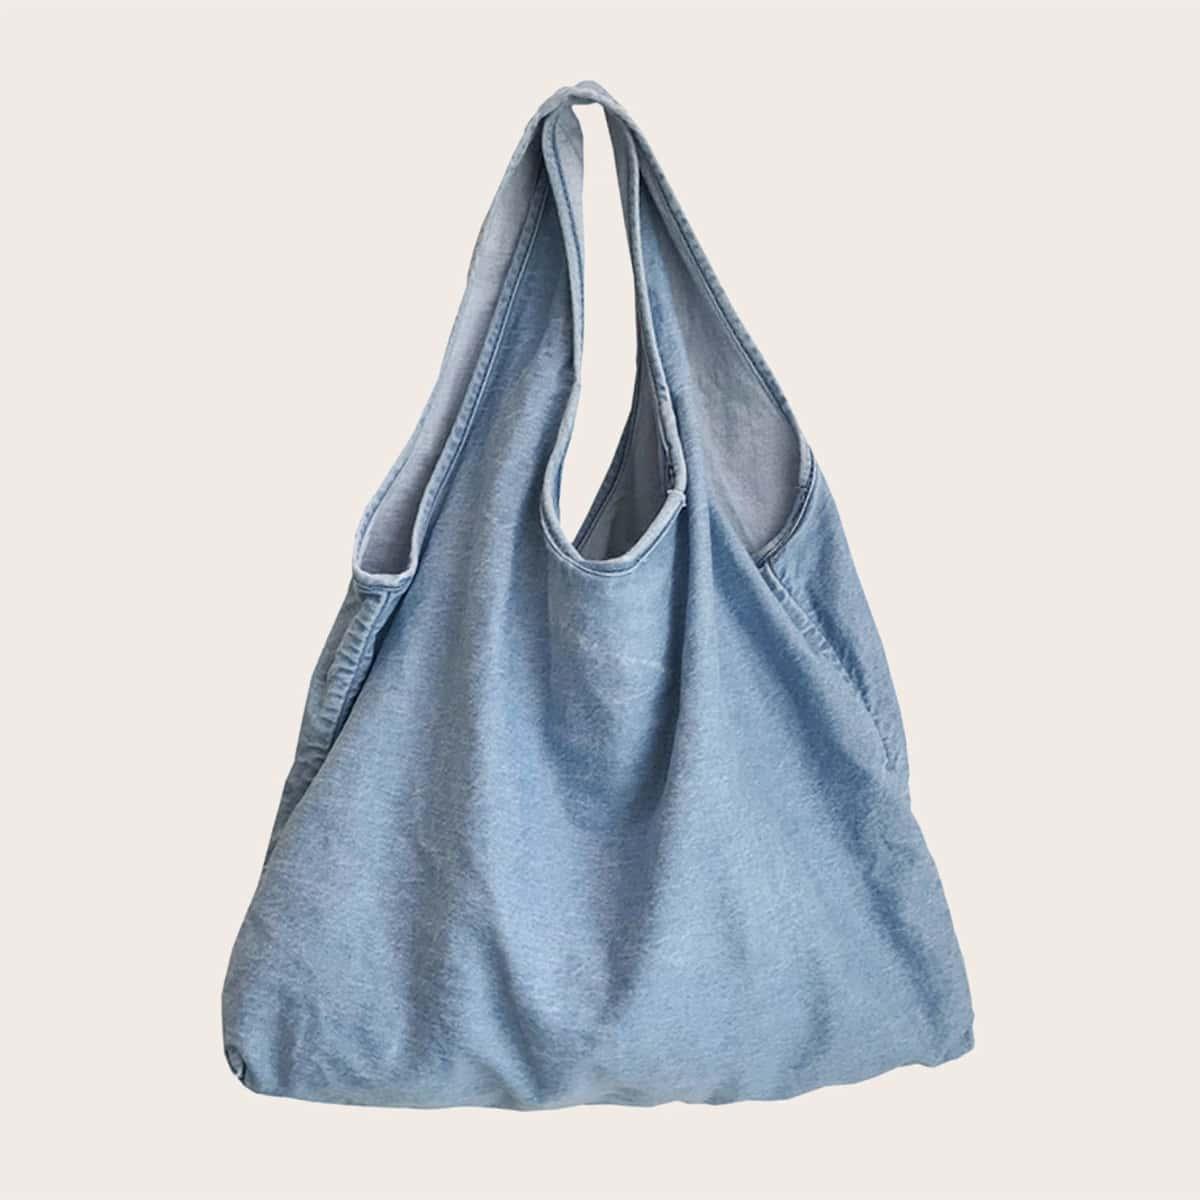 Denim Hobo Bag, SHEIN  - buy with discount